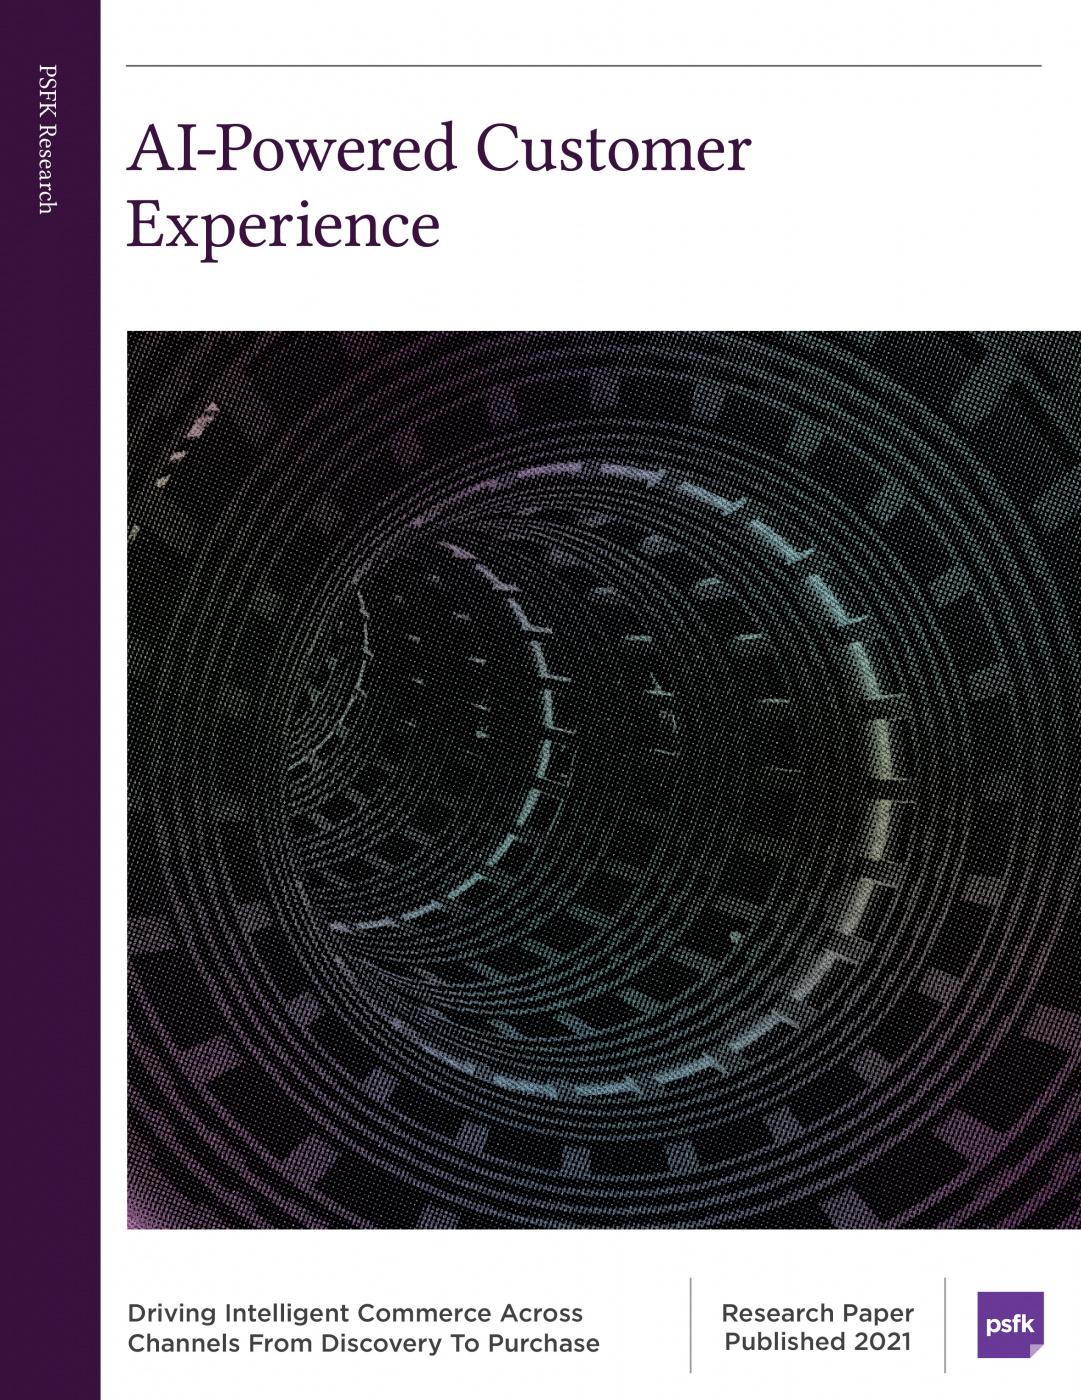 AI-Powered Customer Experience